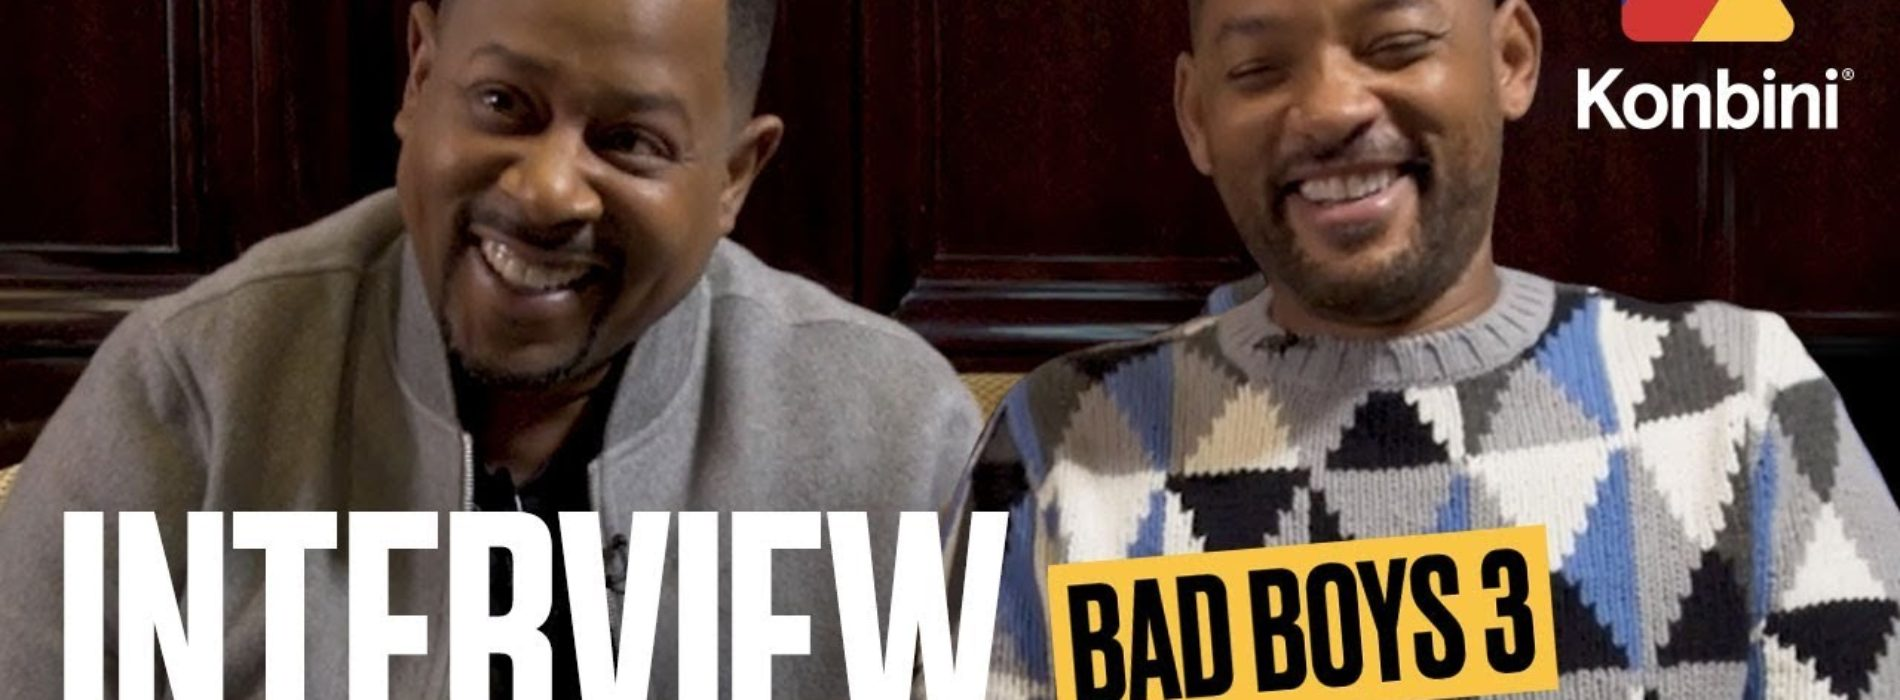 Will Smith & Martin Lawrence – L'interview des Bad Boys qui part en vrille | Konbini –  Meek Mill – Uptown II (Audio) ft. Farruko – Janvier 2020